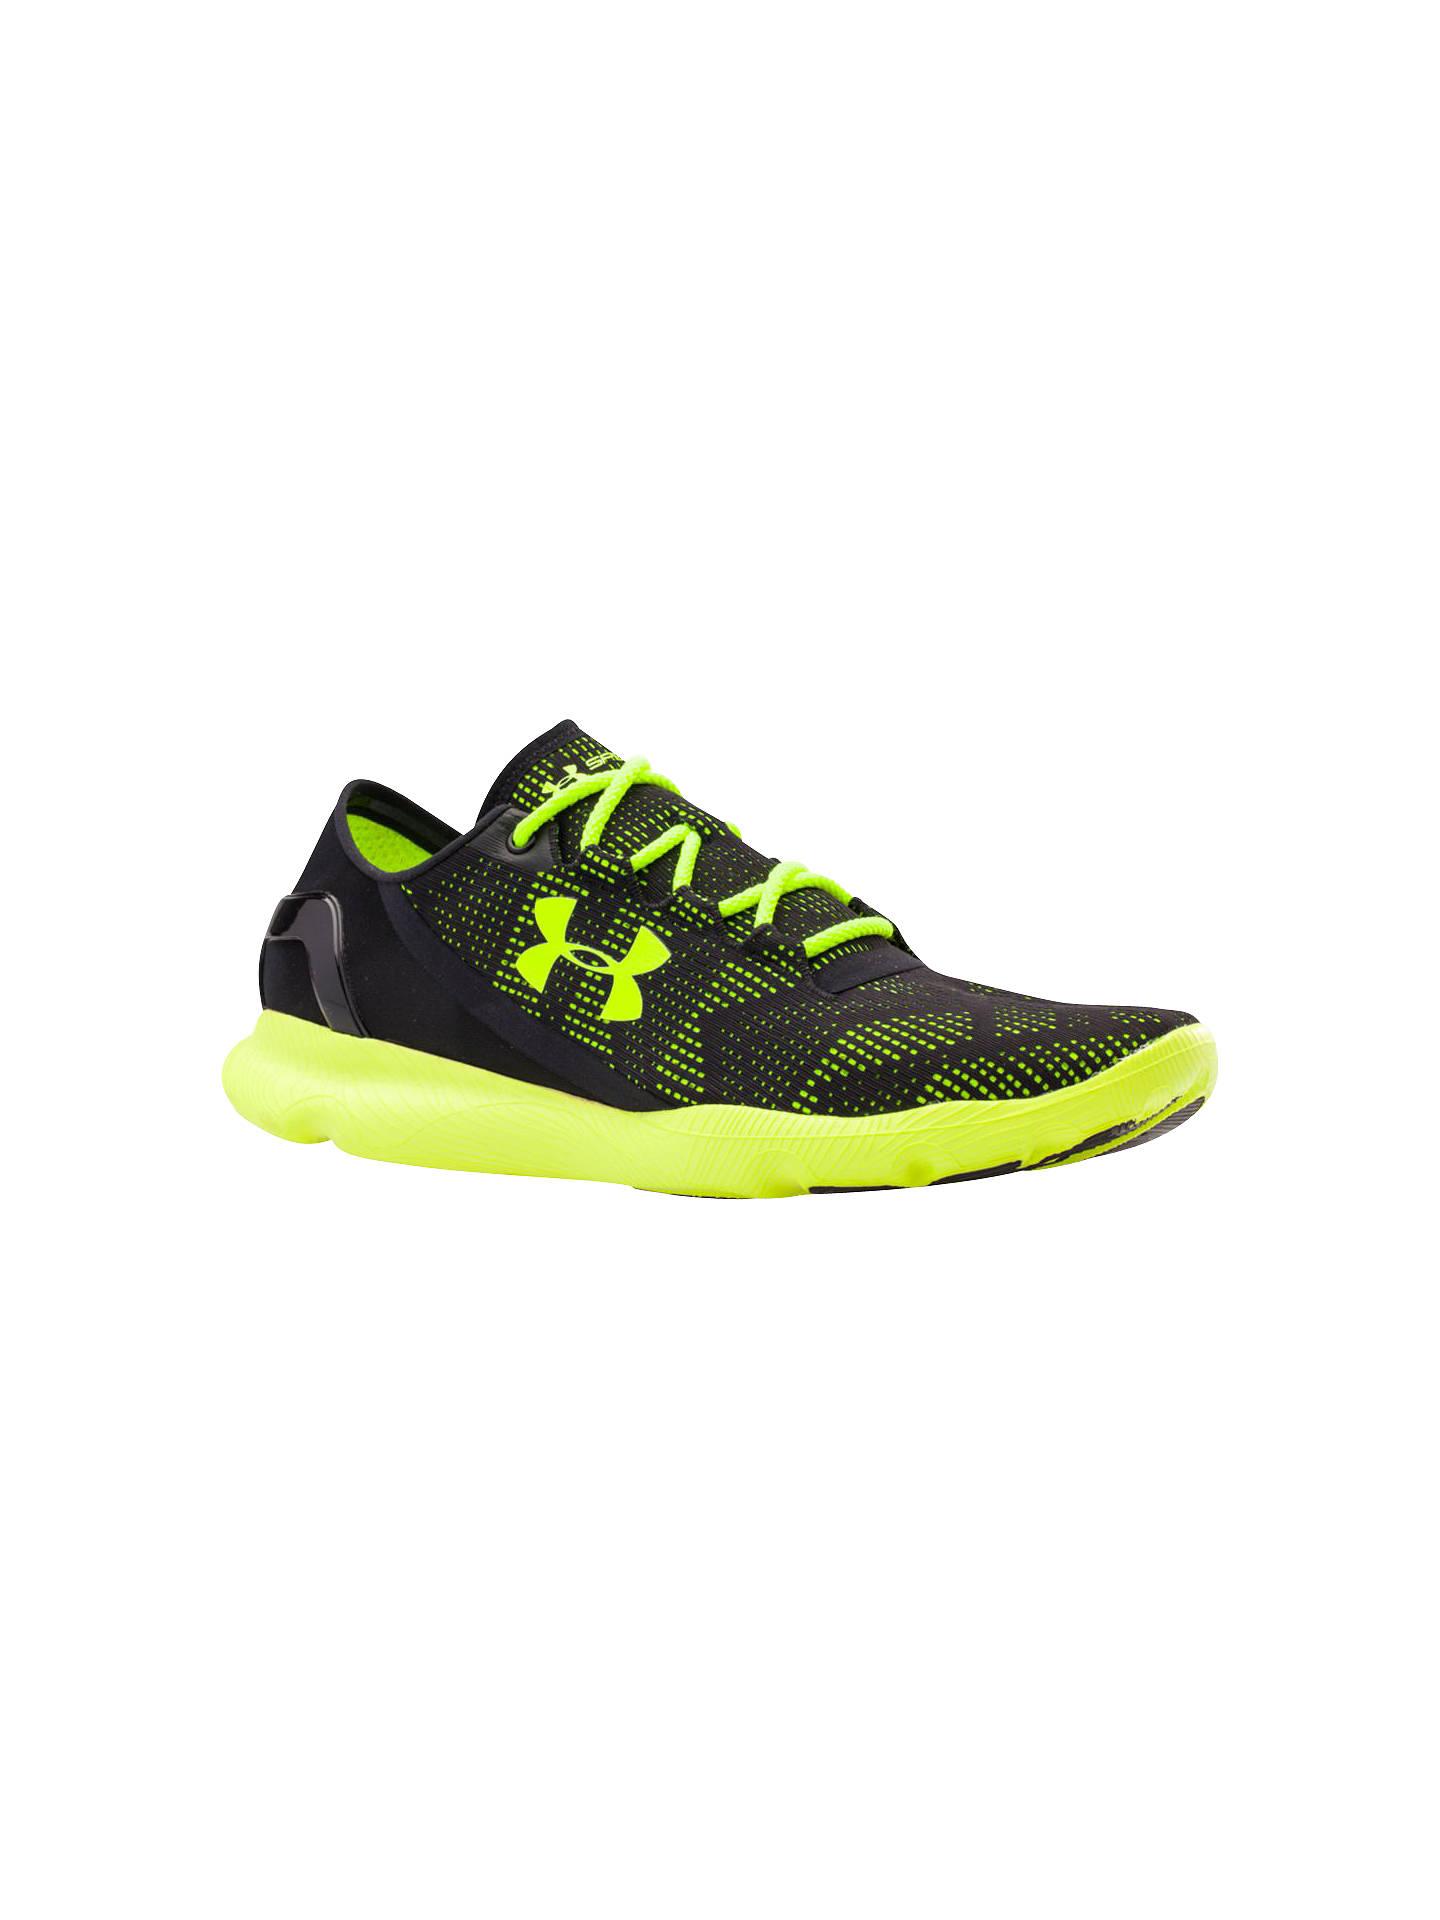 the latest 1db3c e3065 Under Armour SpeedForm Apollo Vent Men's Running Shoes ...